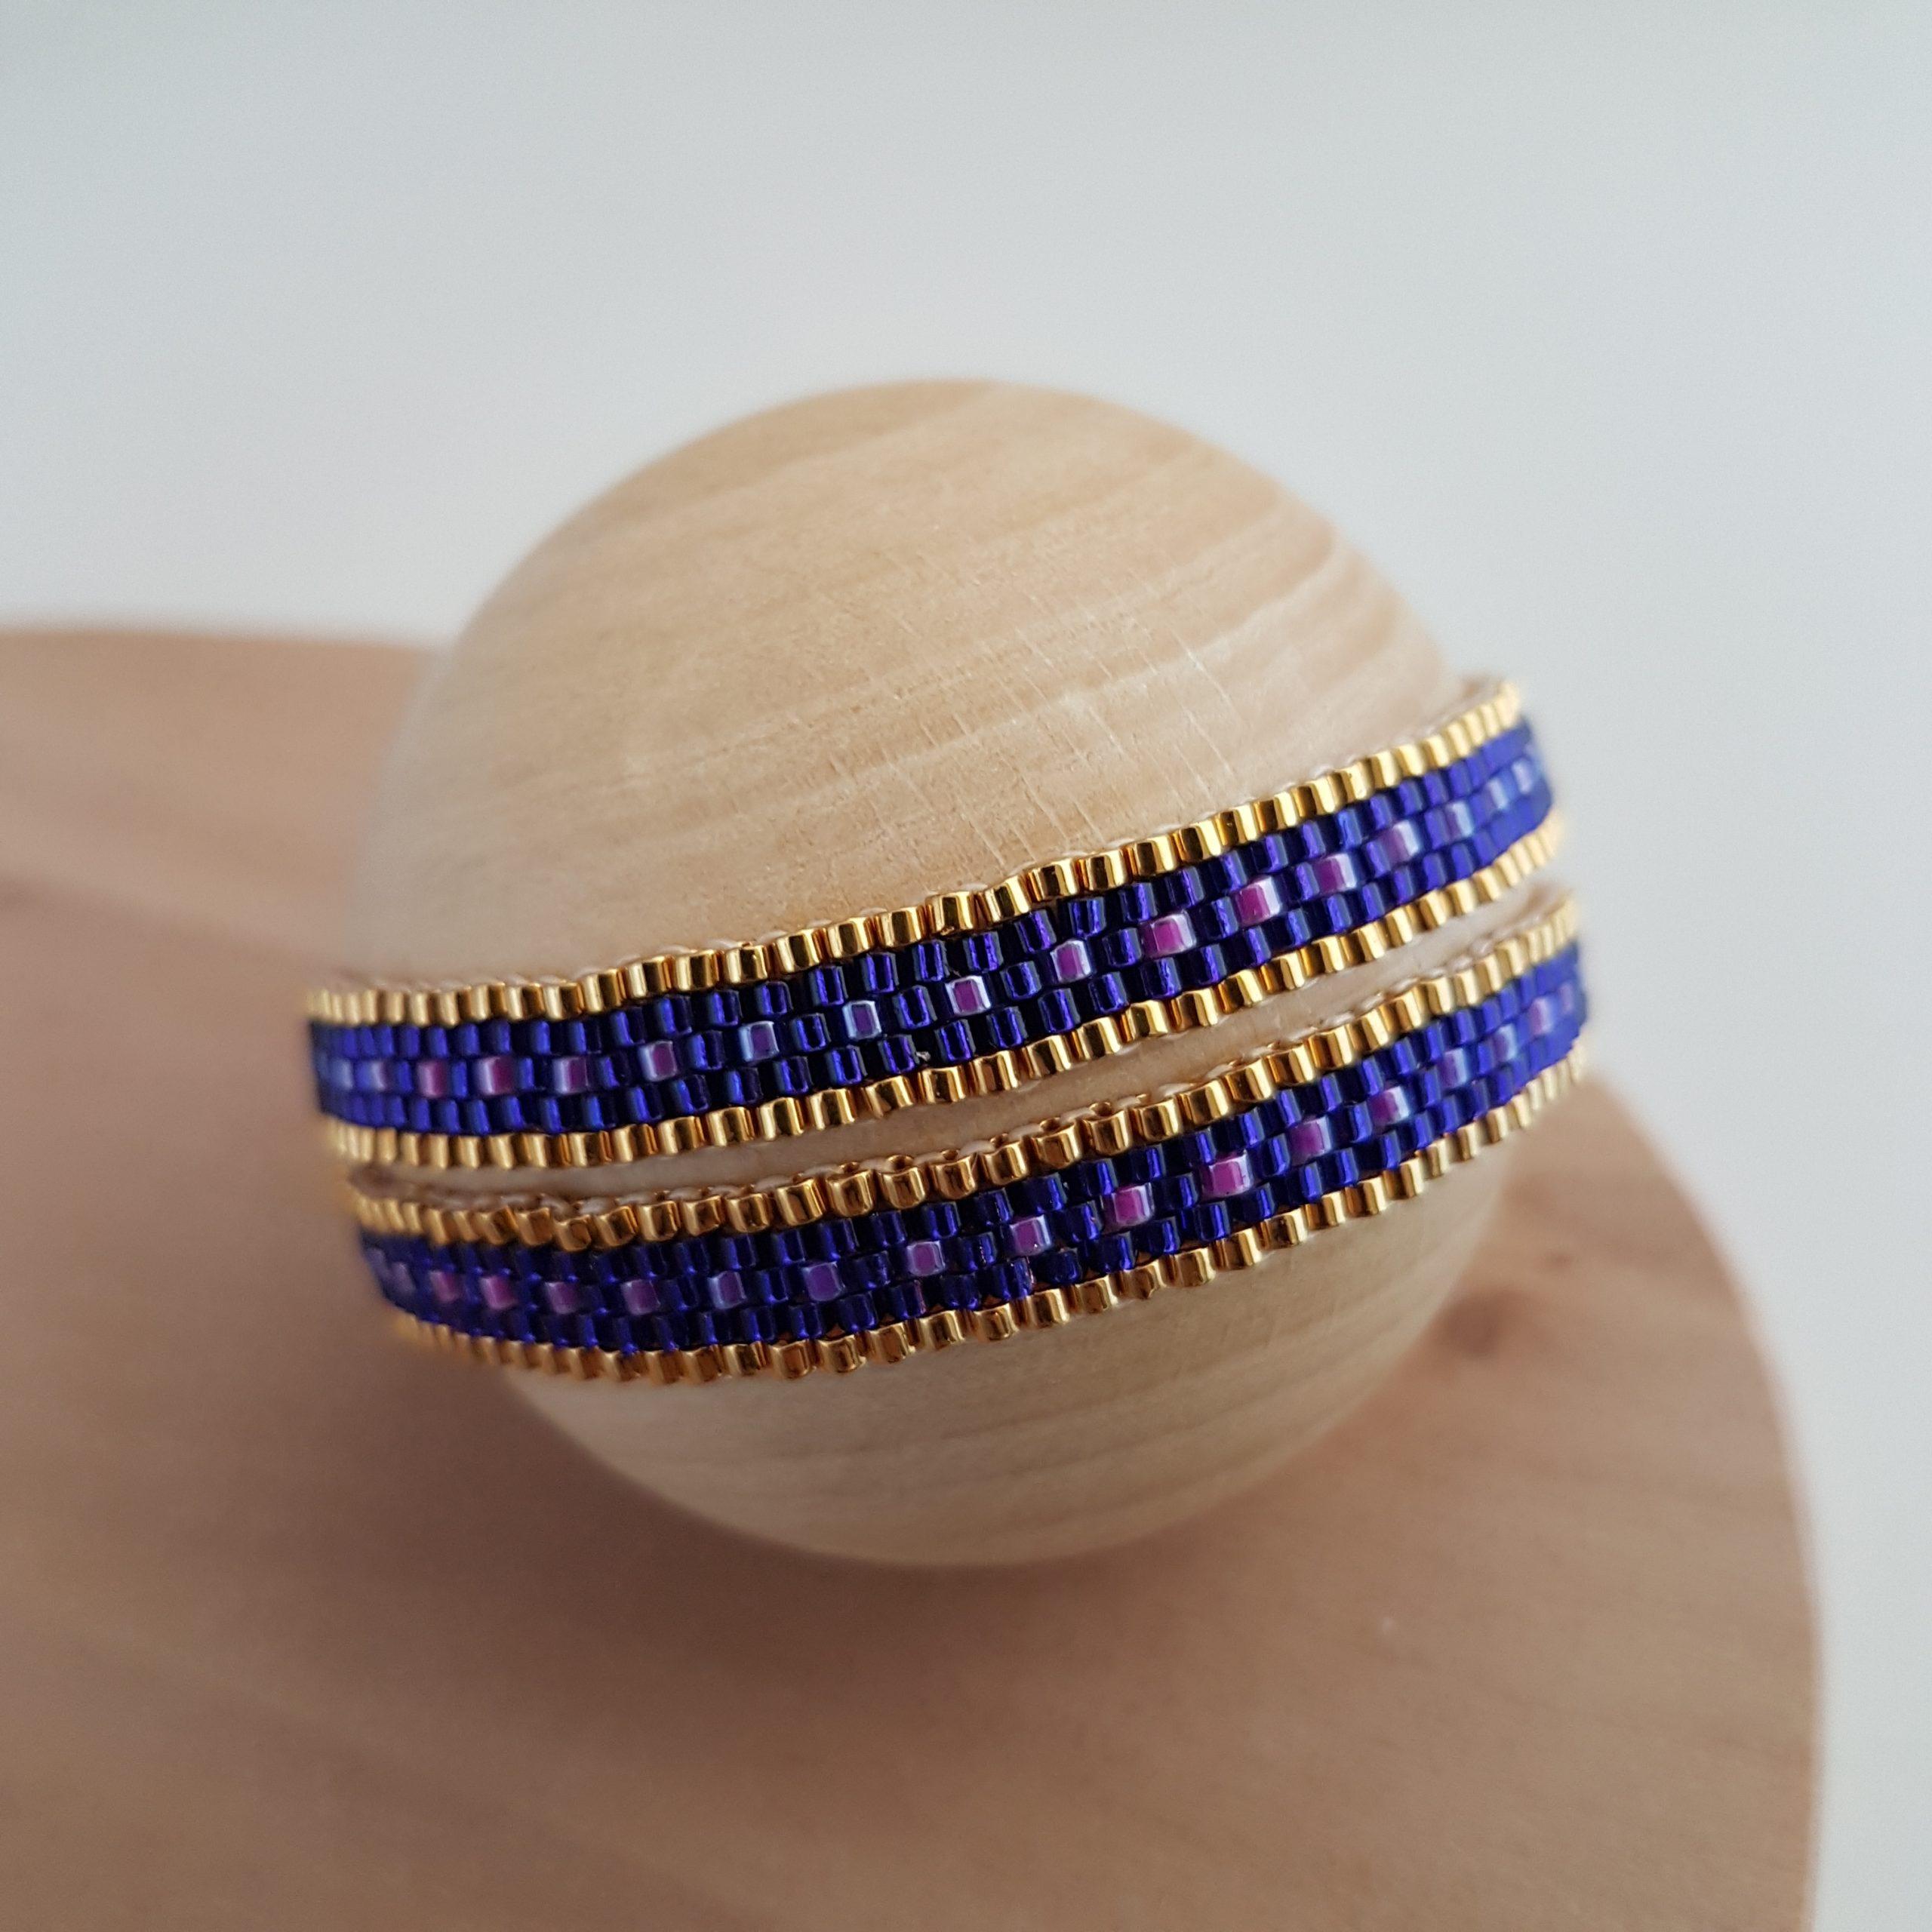 Cadeau femme Bijou artisanal lyon Bracelet double Camila violet plaqué or miyuki